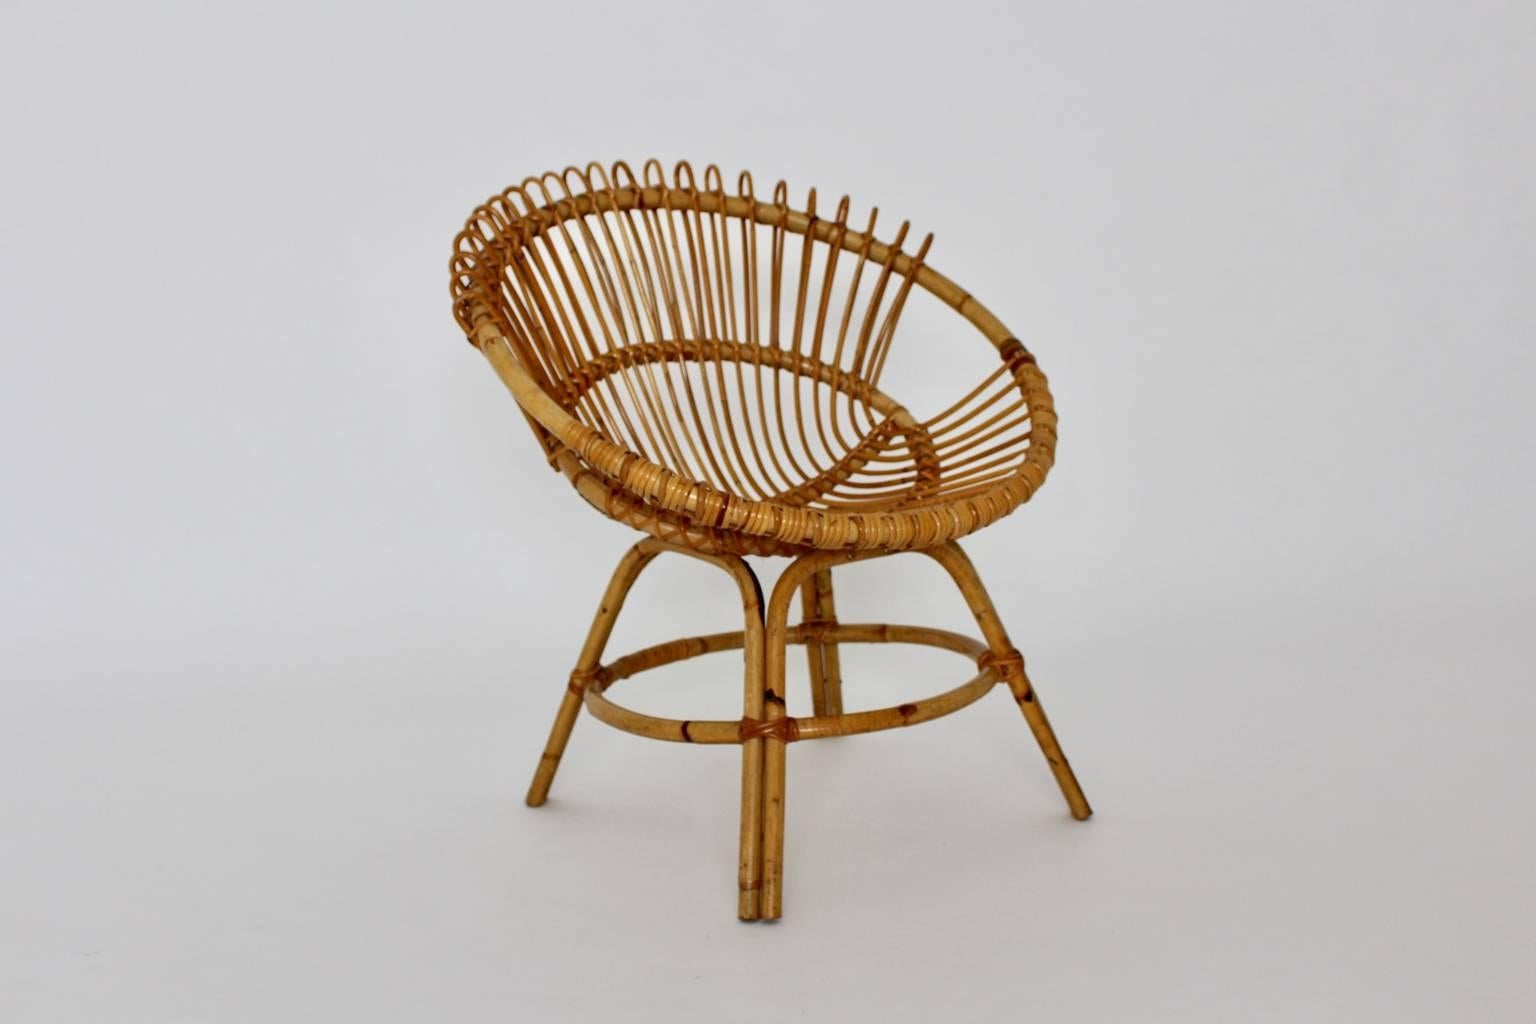 Mid Century Modern Rattan Chair Midcentury By Janine Abraham U0026 Dirk Jan  Rol, France